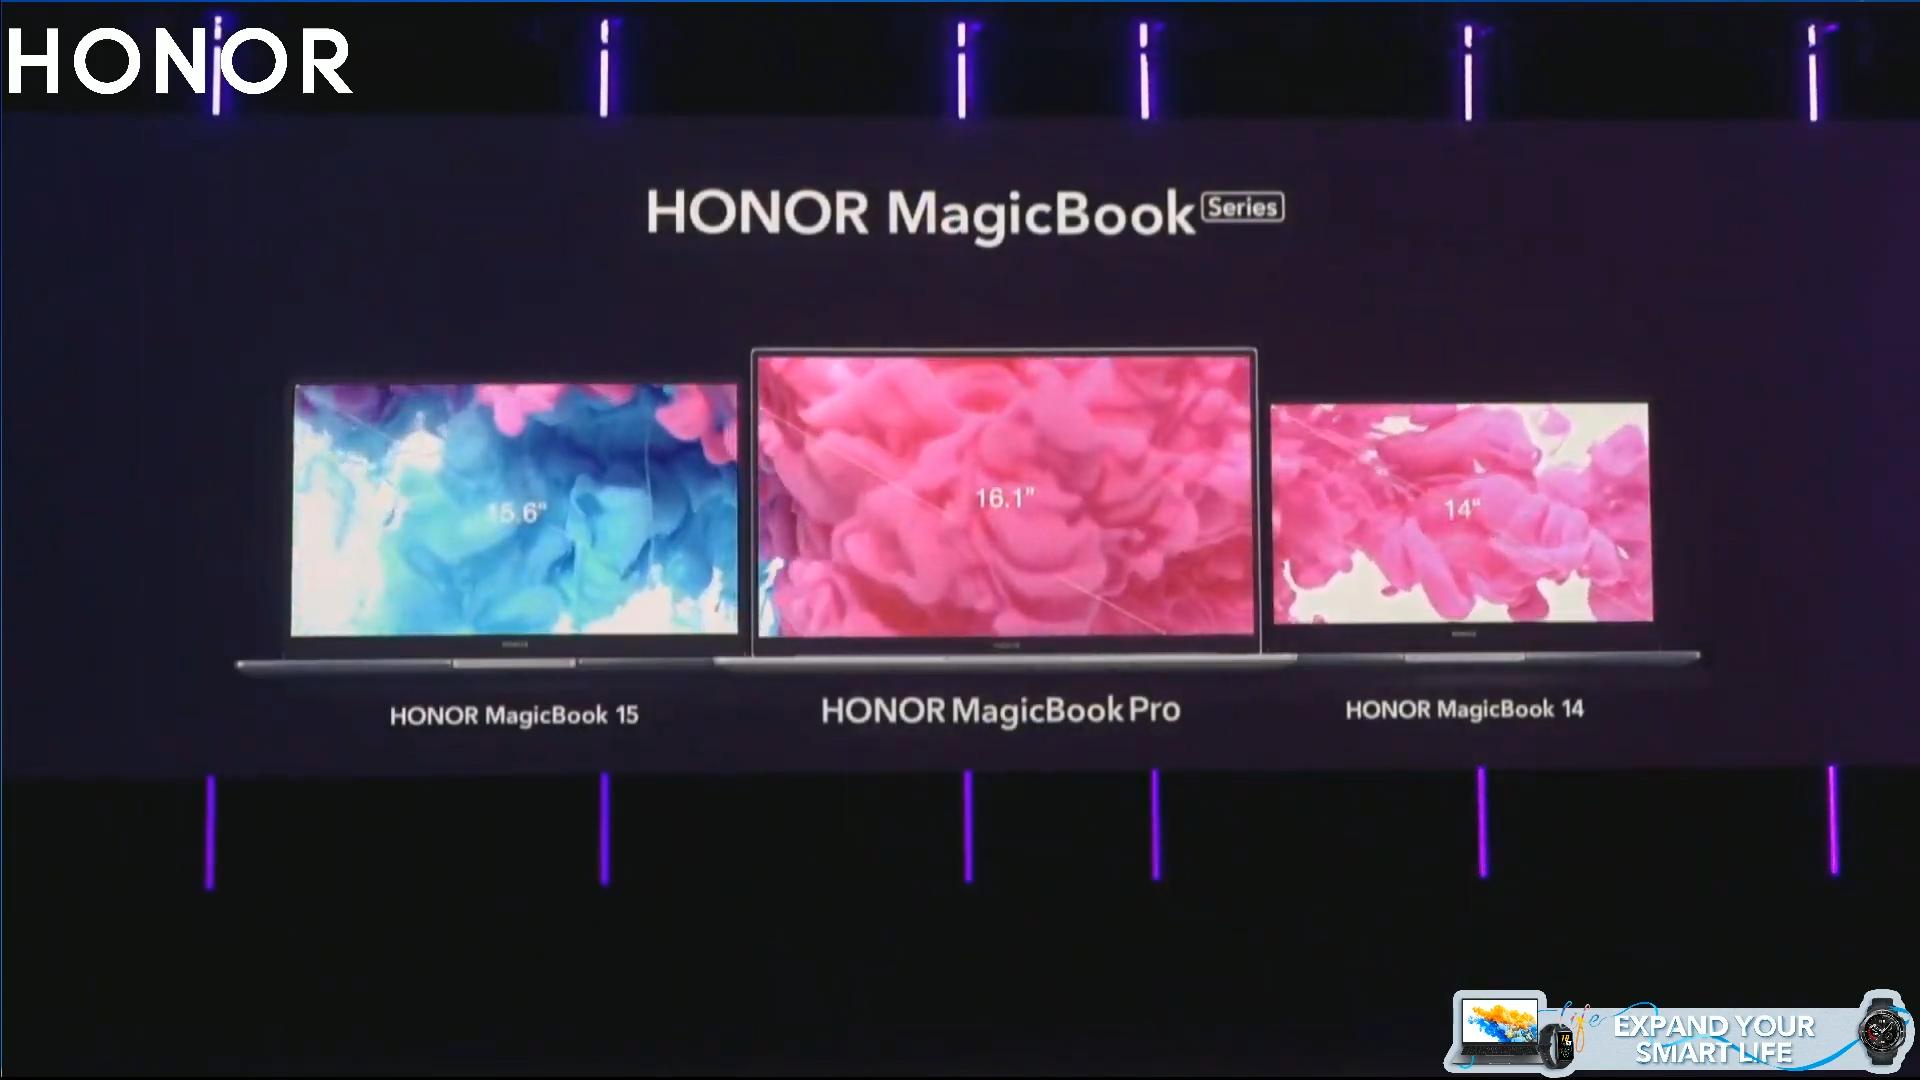 [IFA 2020] Presentati i prossimi Honor Watch, MagicBook e Pad 6 4